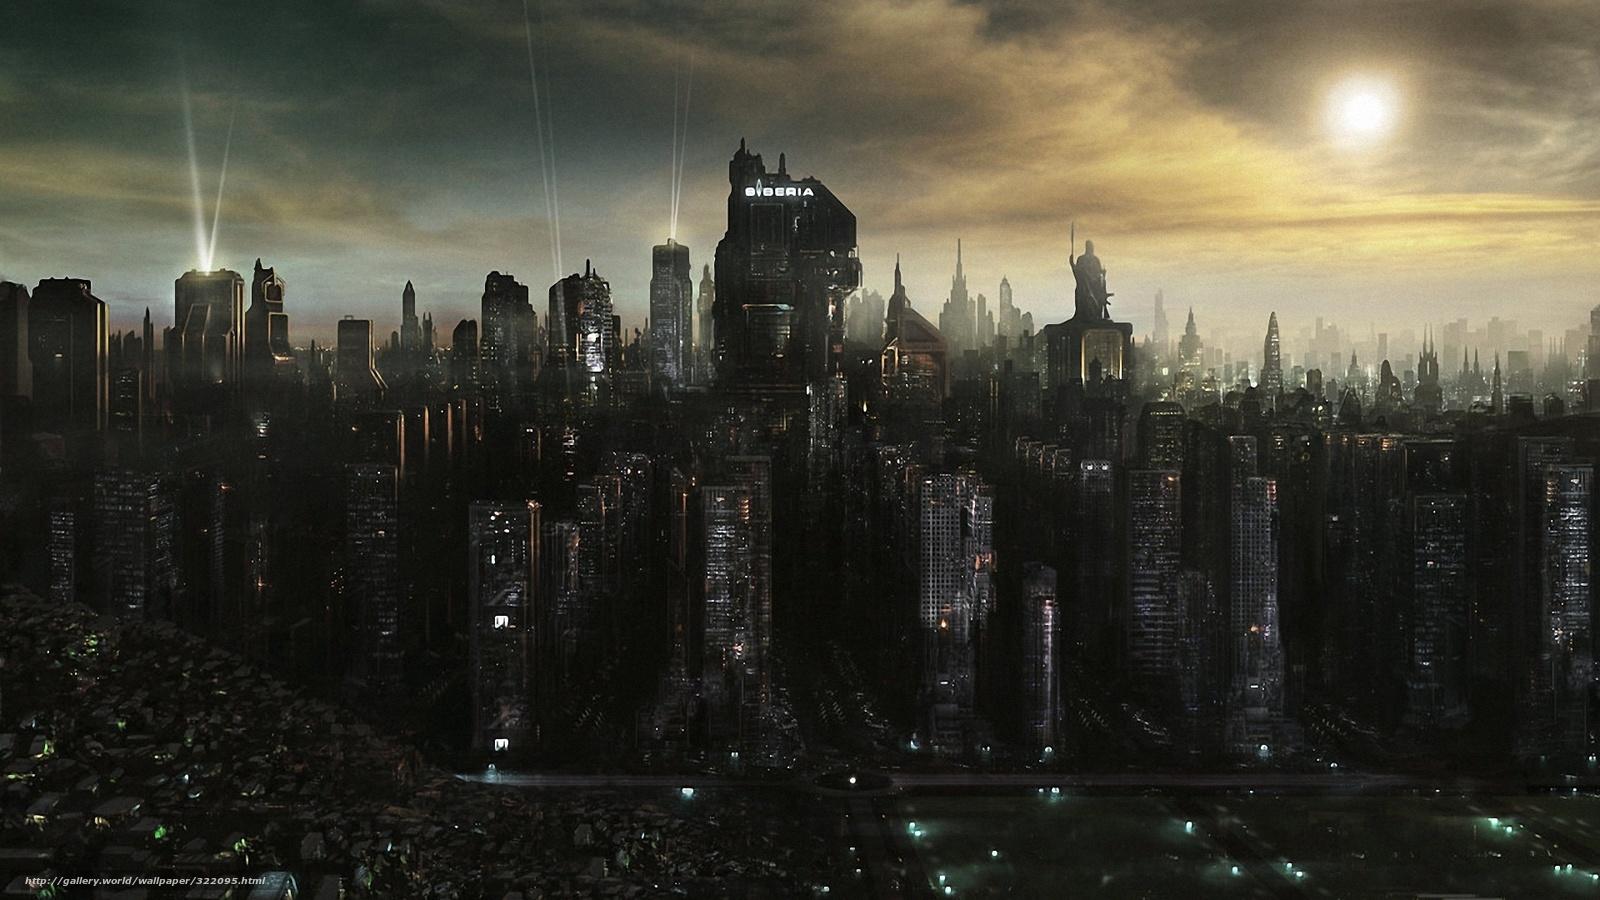 Download wallpaper Siberia,  city,  of the future free desktop wallpaper in the resolution 1920x1080 — picture №322095